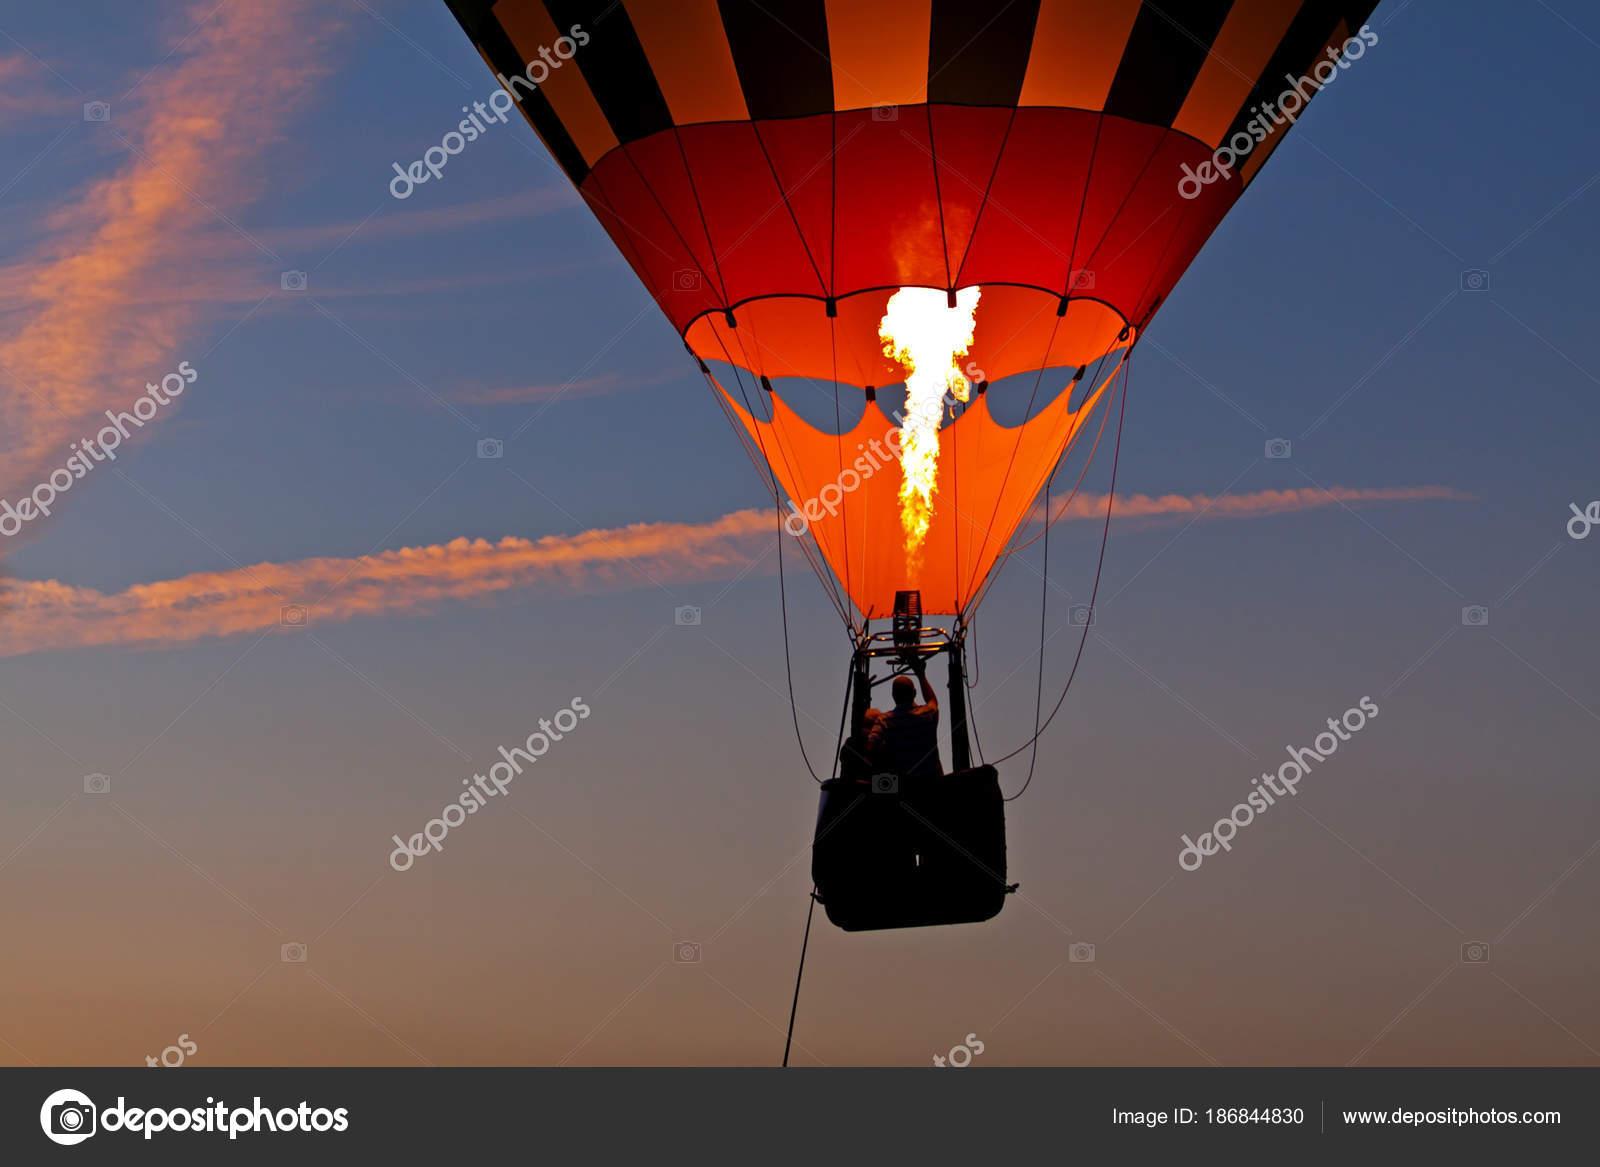 montgolfiere feu